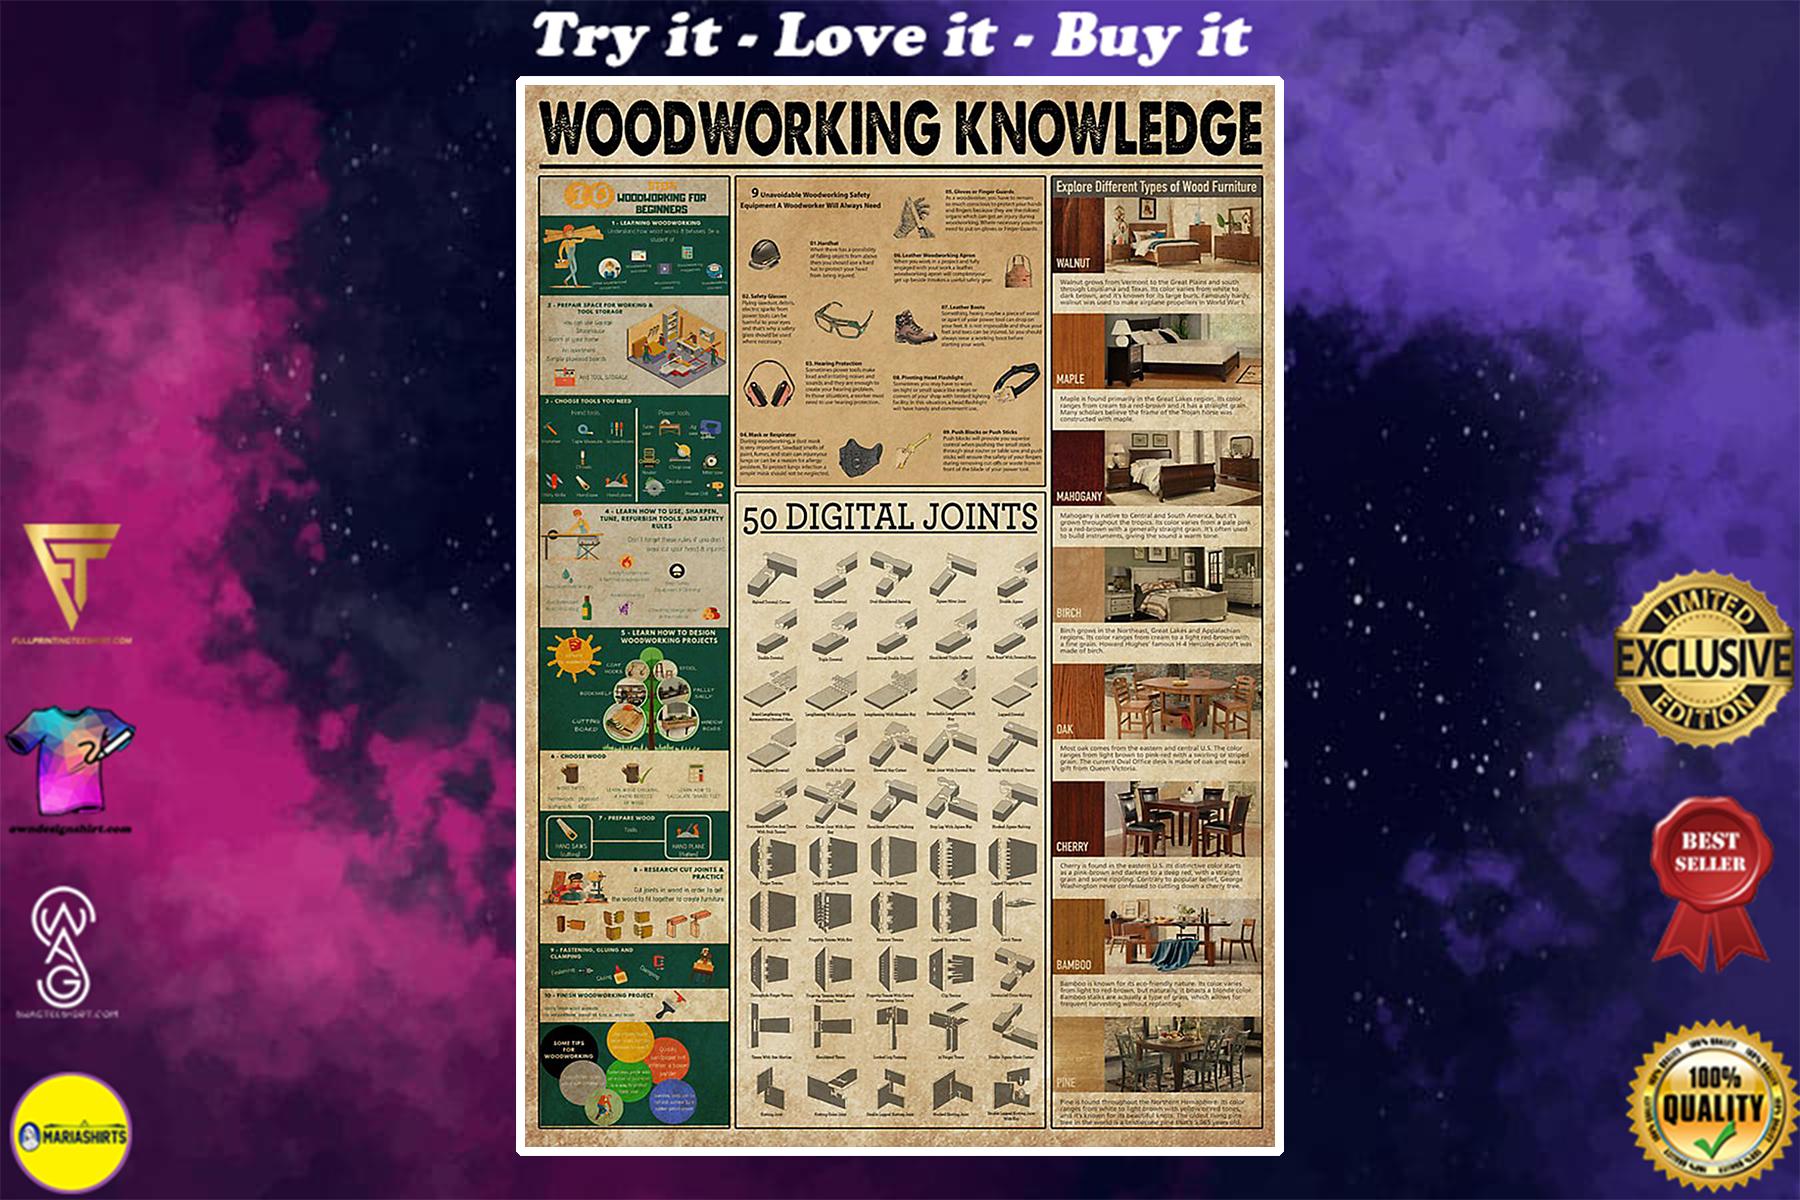 vintage carpenter woodworking knowledge poster